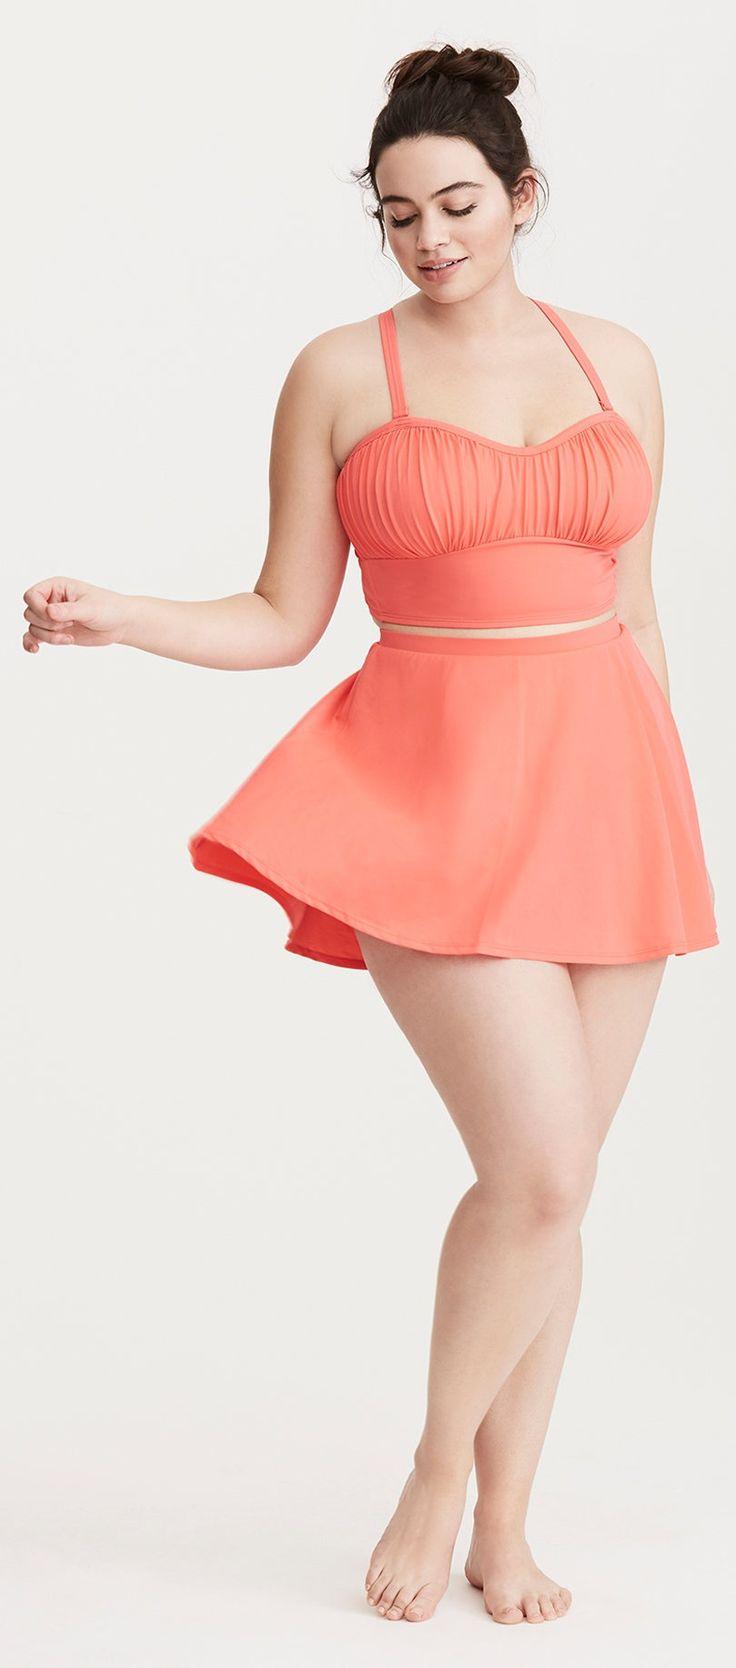 Plus Size Ruched Bikini Swimsuit - Plus Size Swimsuit